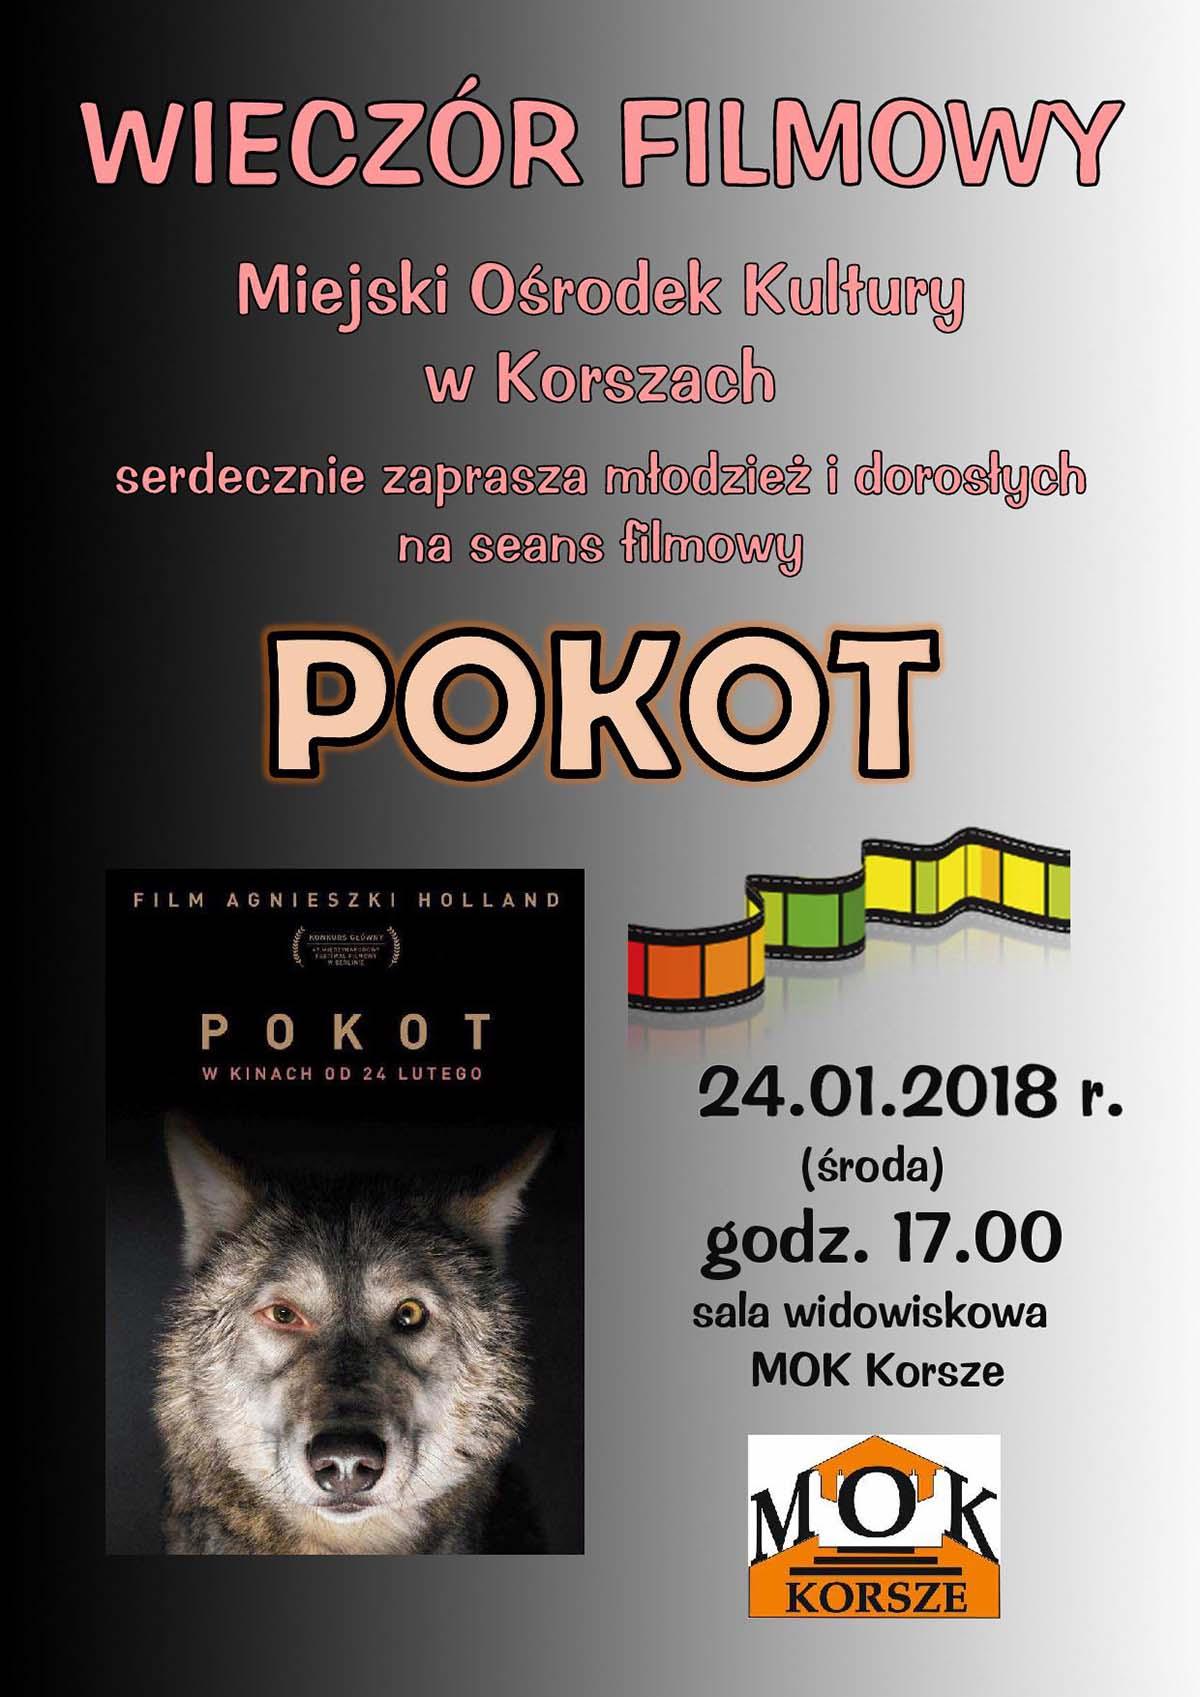 http://m.wm.pl/2018/01/orig/0000003062-wiecz-s-t-r-filmowy-pokot-441507.jpg